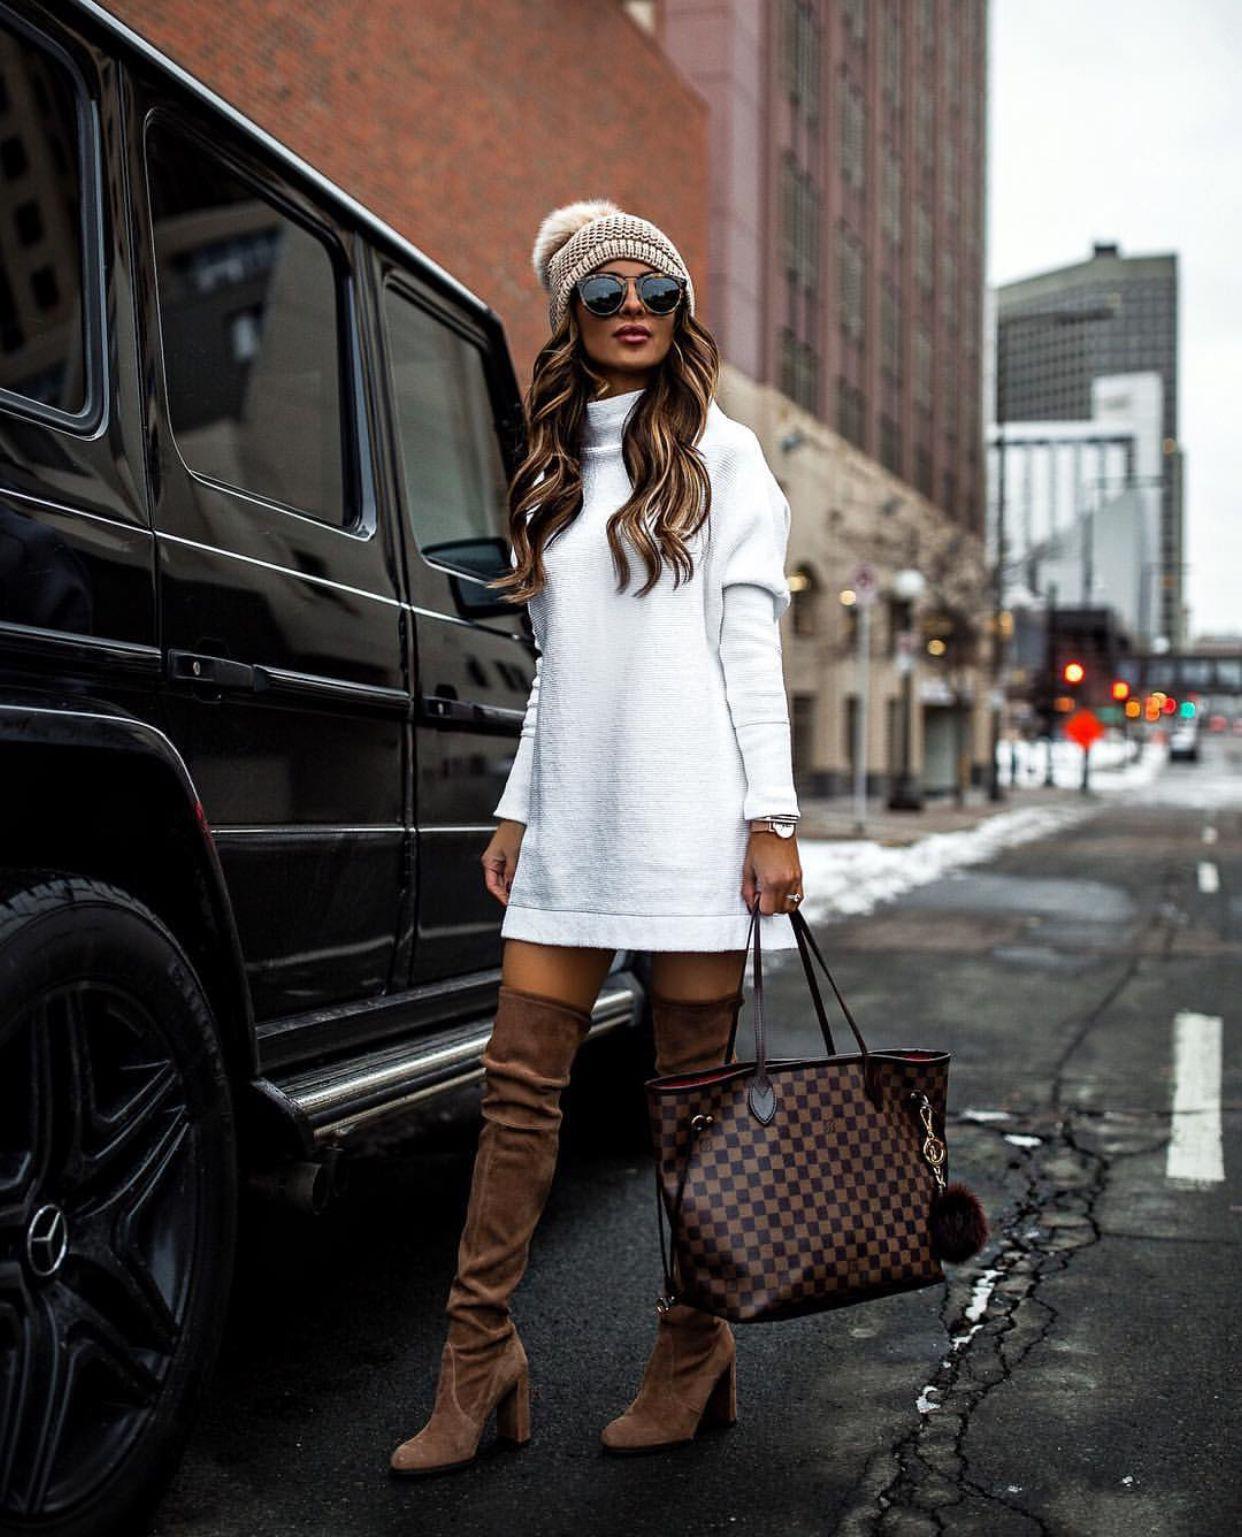 Mia mia mine sweater, winter clothing, street fashion, casual wear